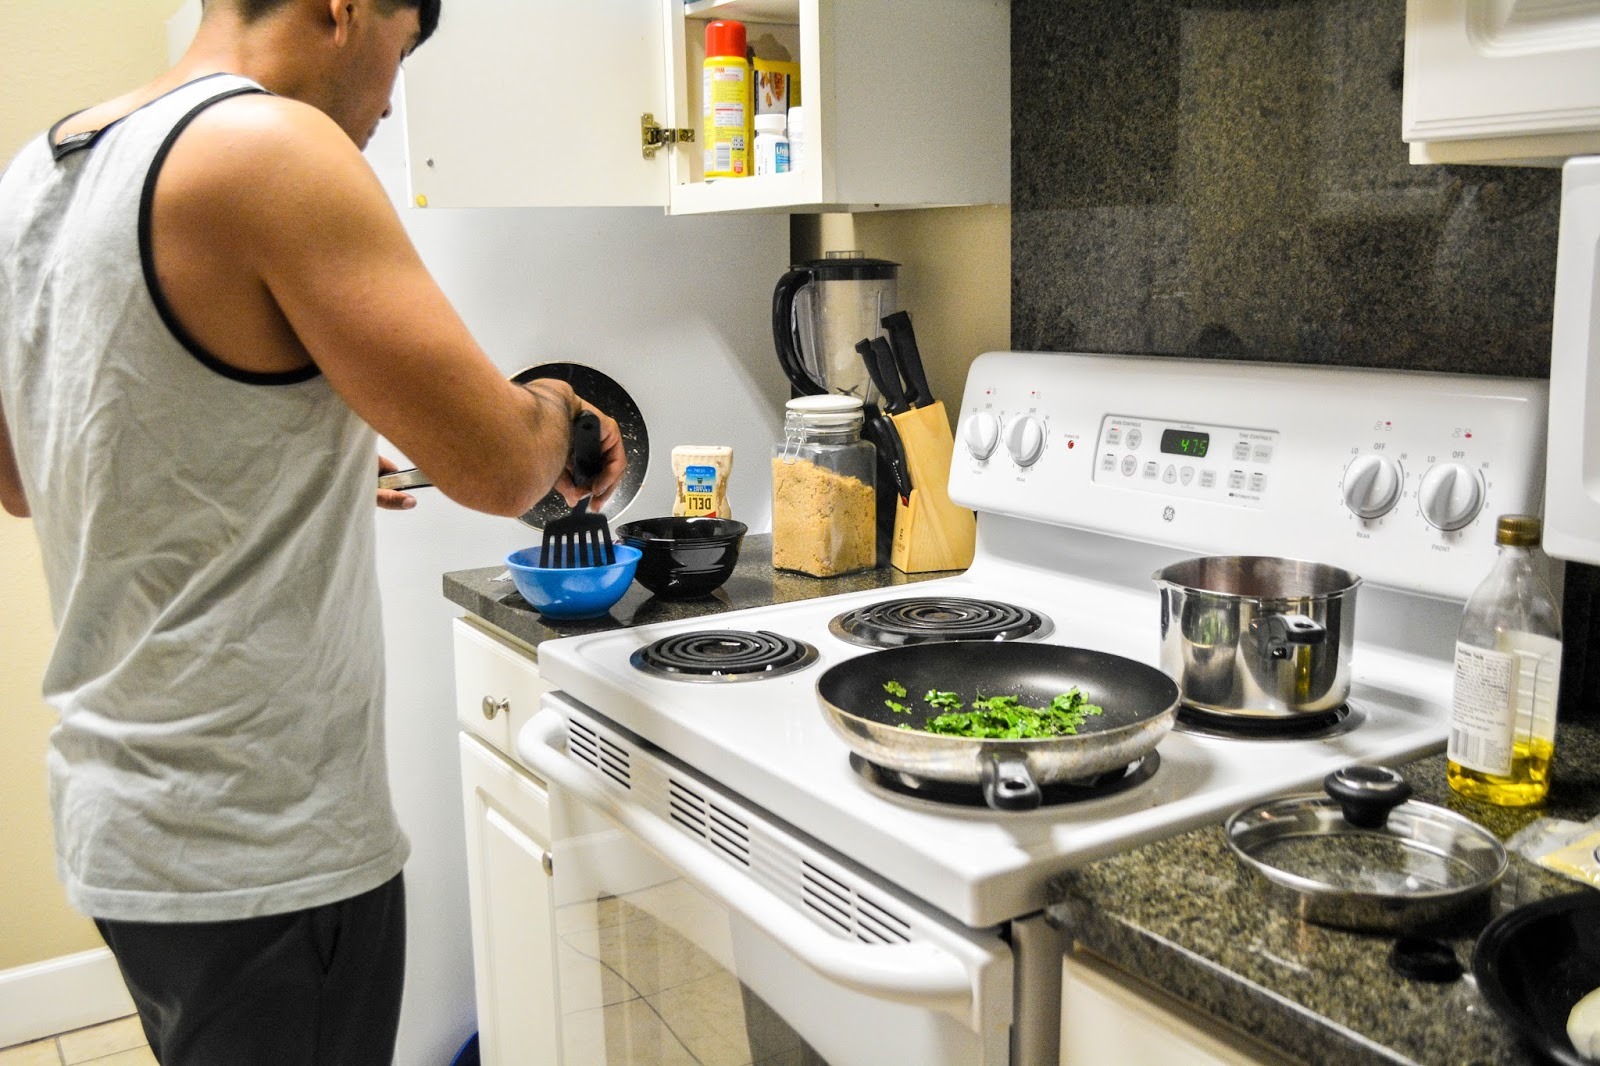 blue apron recipe #3